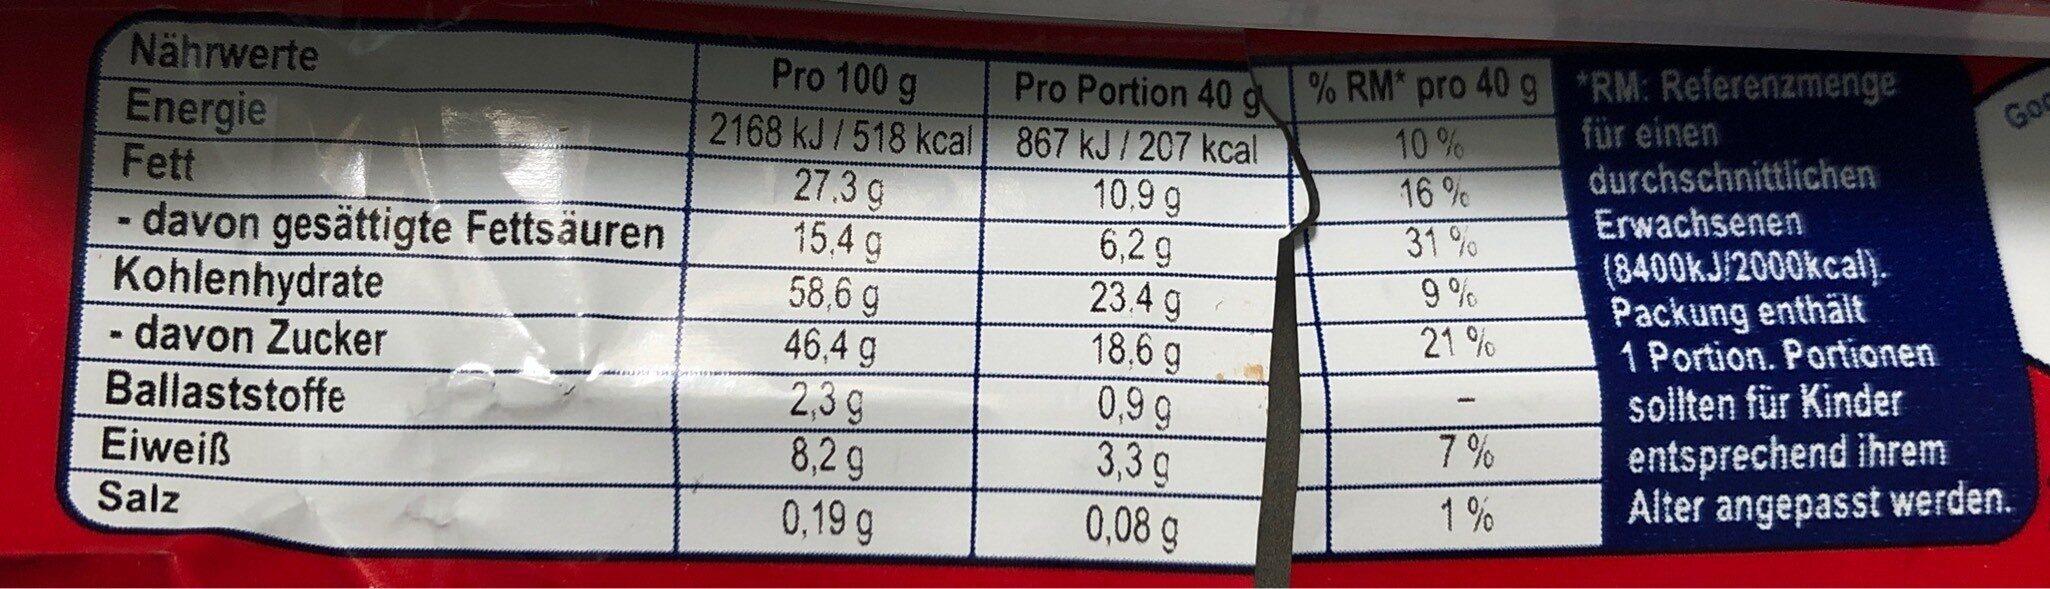 KitKat Chunky - Informations nutritionnelles - de